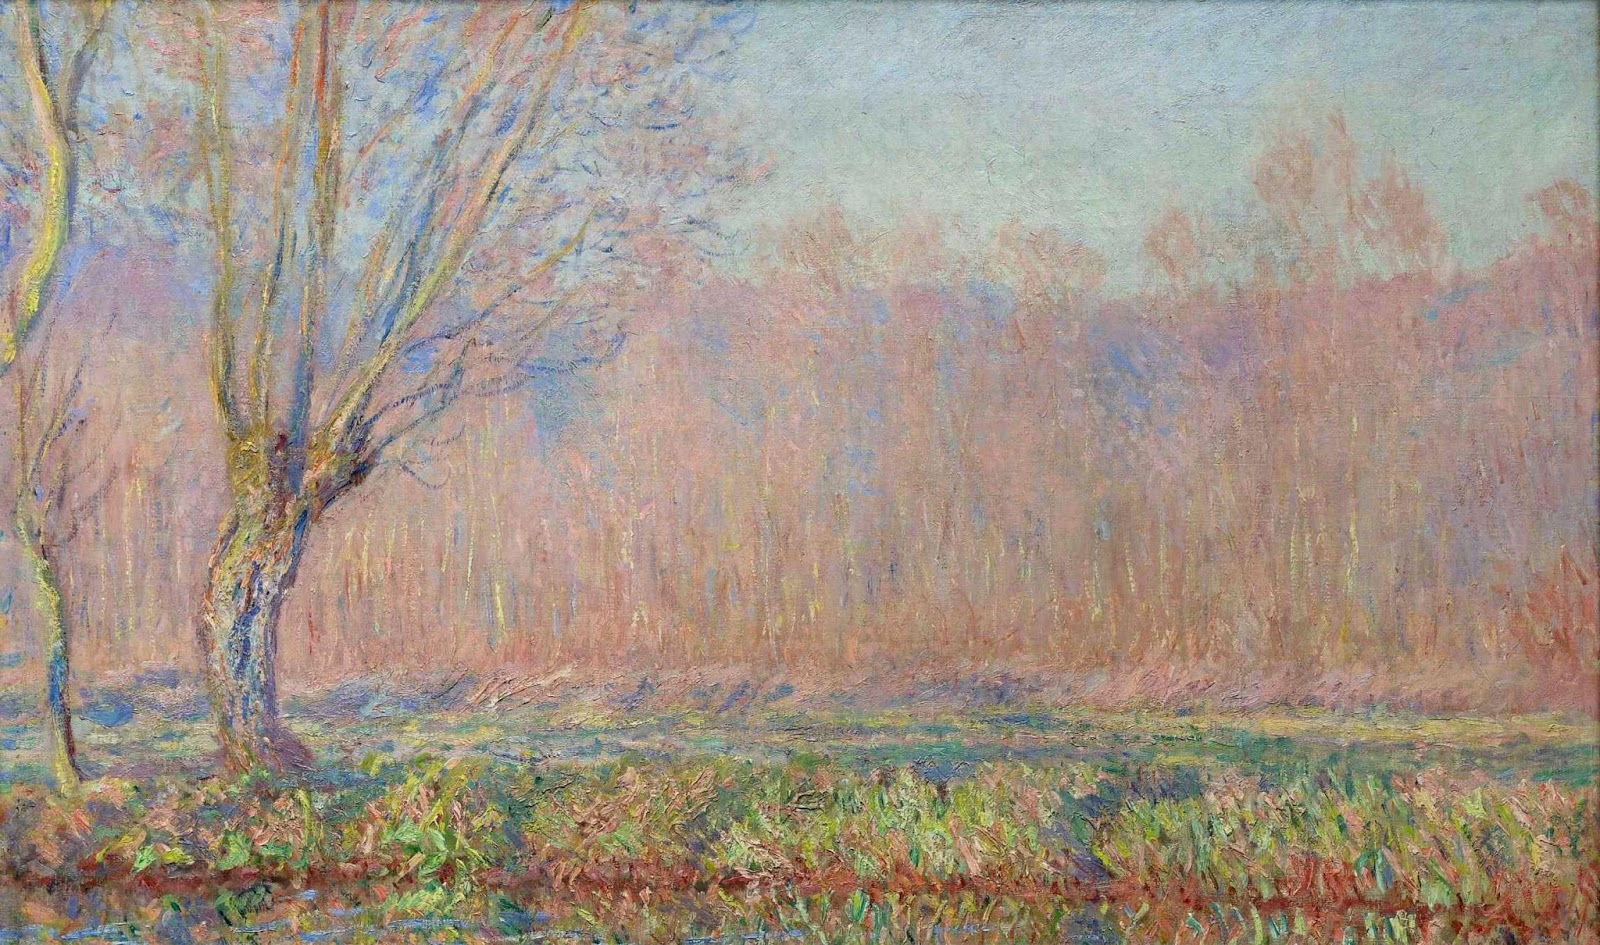 Claude monet impressionist plein air painter part 5 for Claude monet impressionist paintings